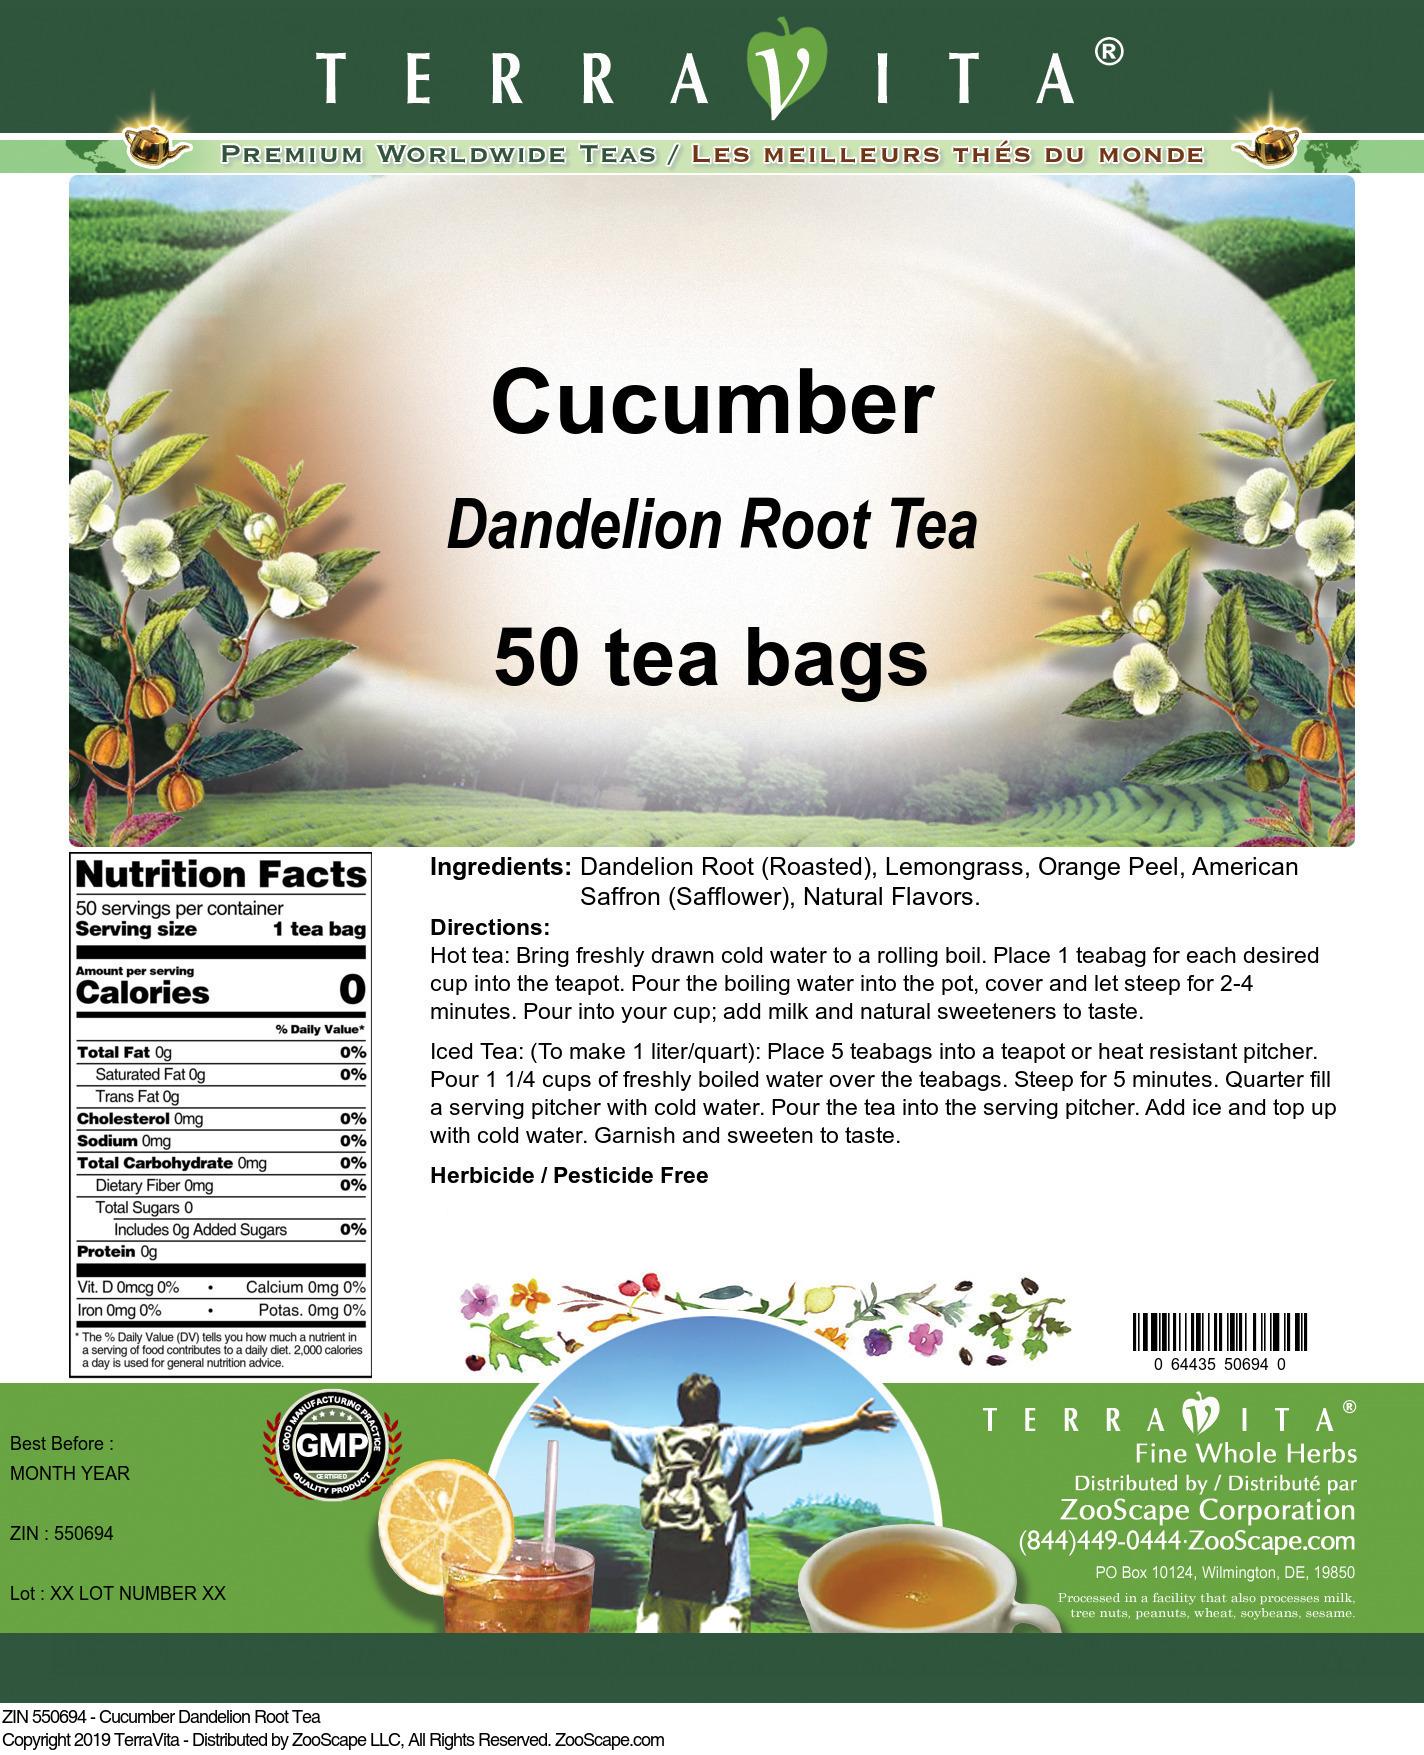 Cucumber Dandelion Root